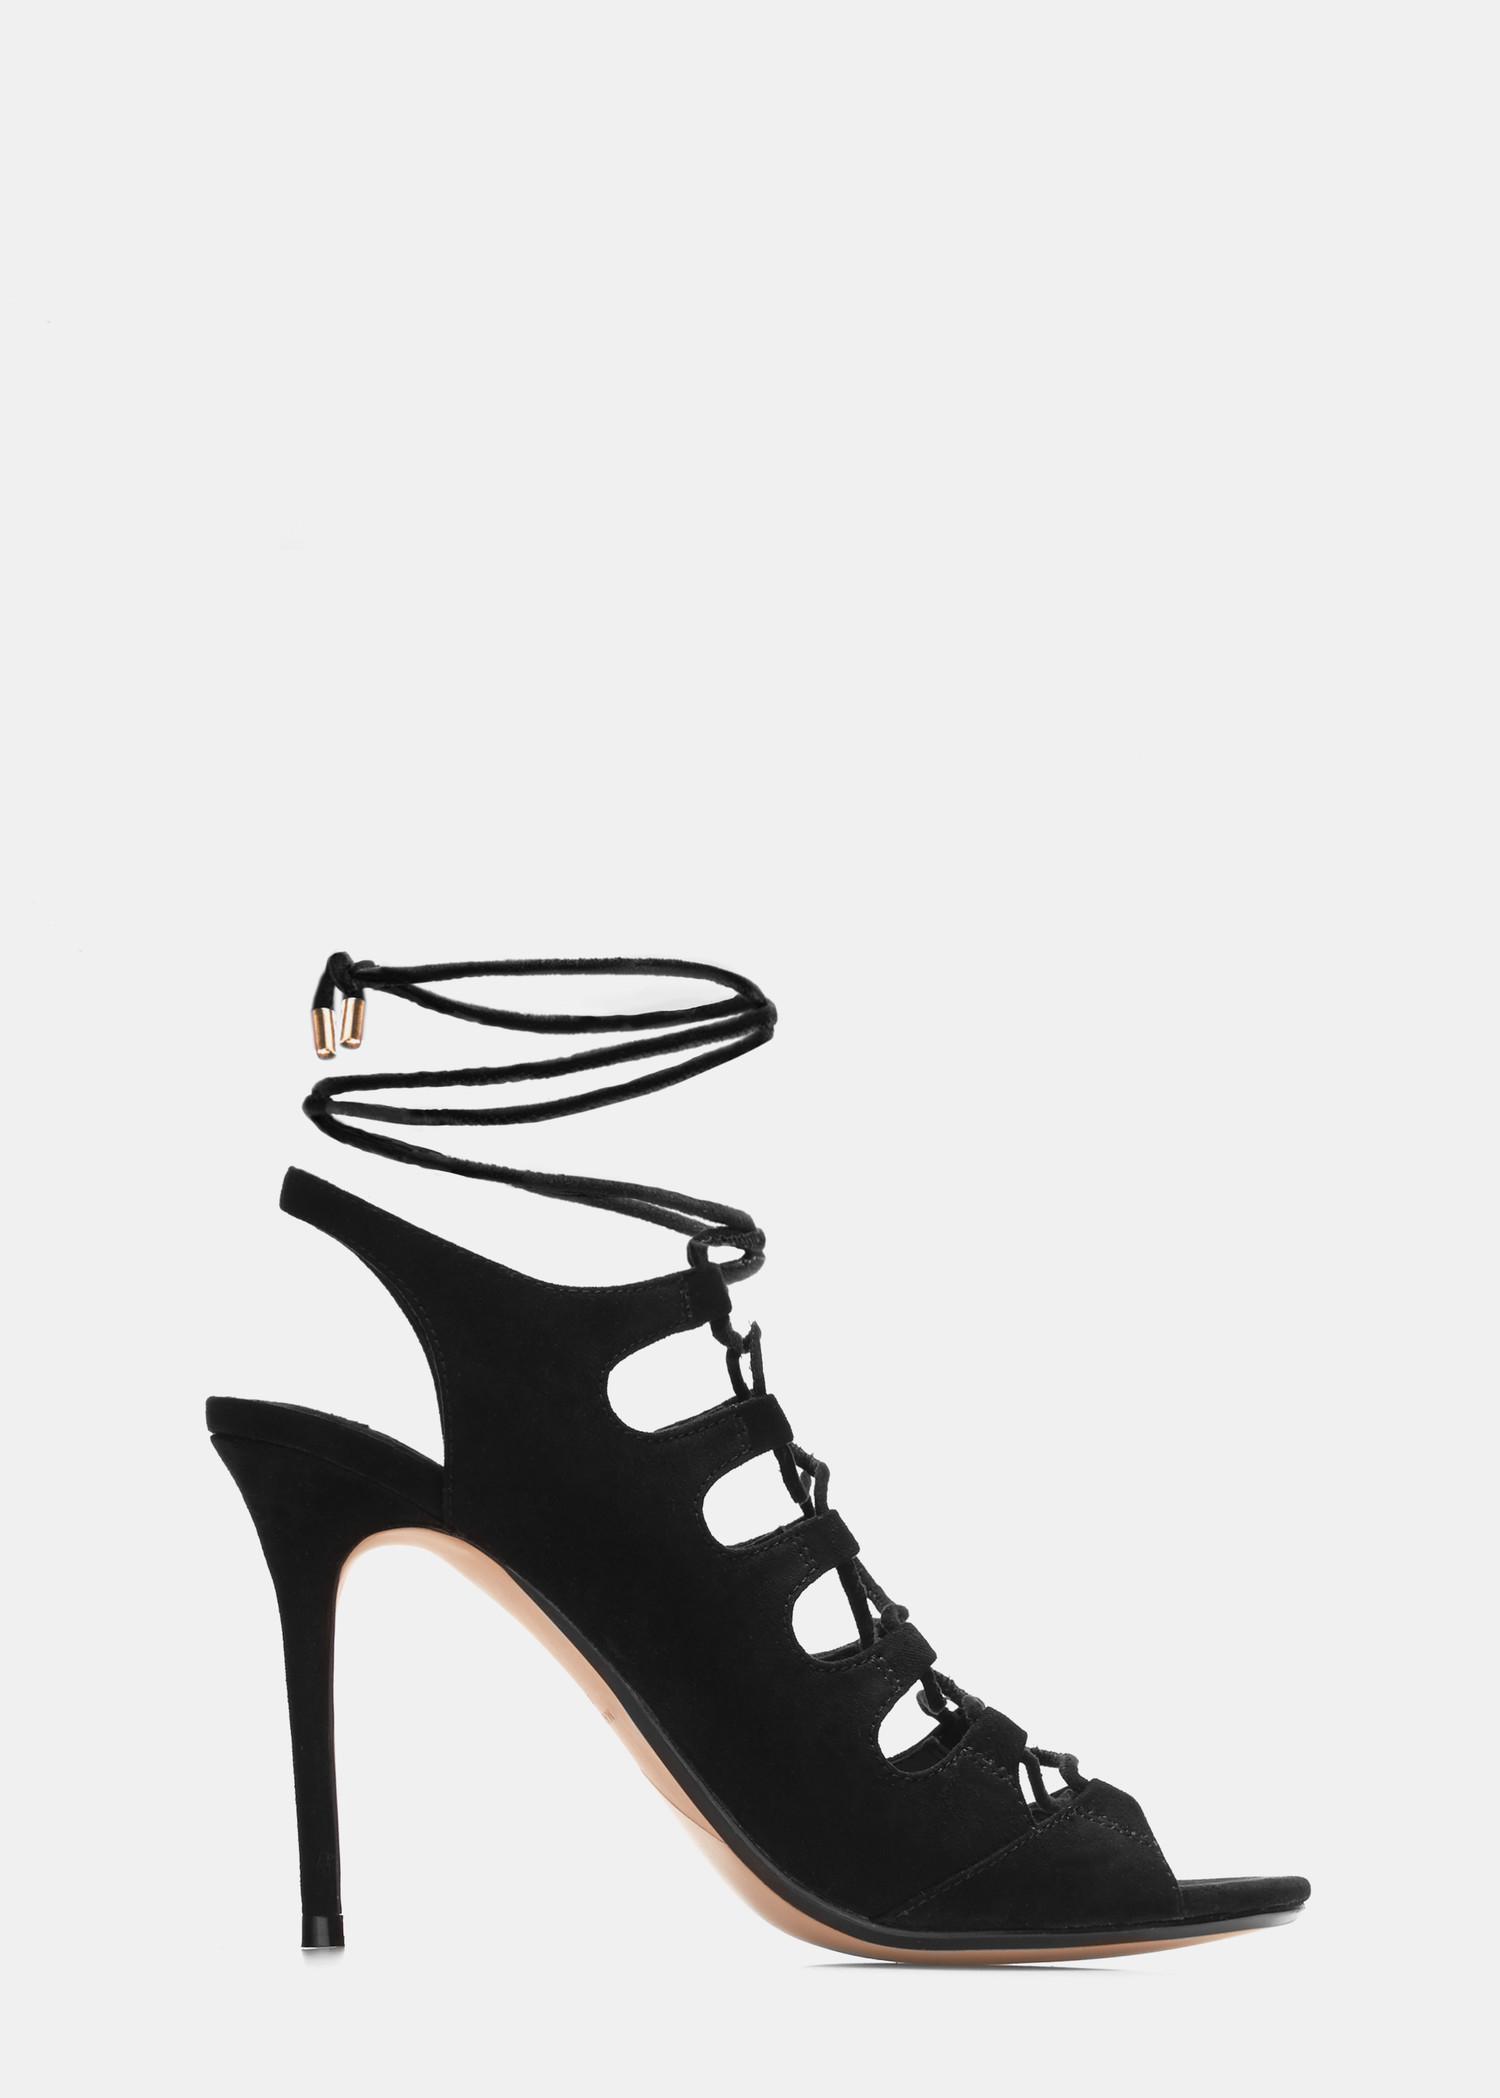 588b0f76ec3 Lyst - Mango Slingback Lace-up Sandals in Black